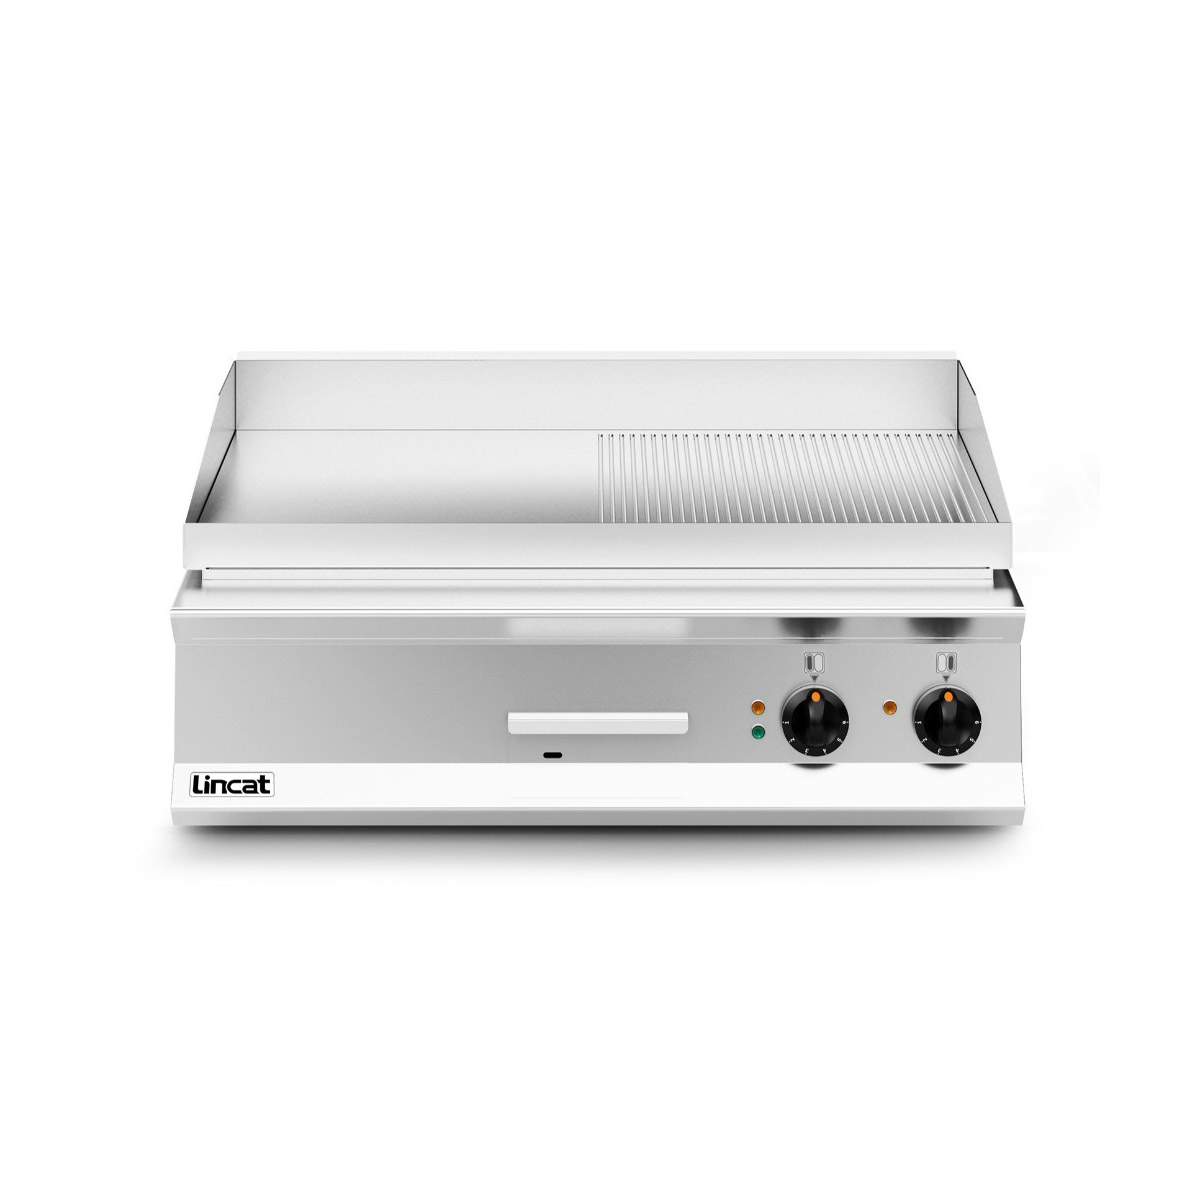 Lincat Opus 800 Half Ribbed Electric Griddle Model: OE8206/R